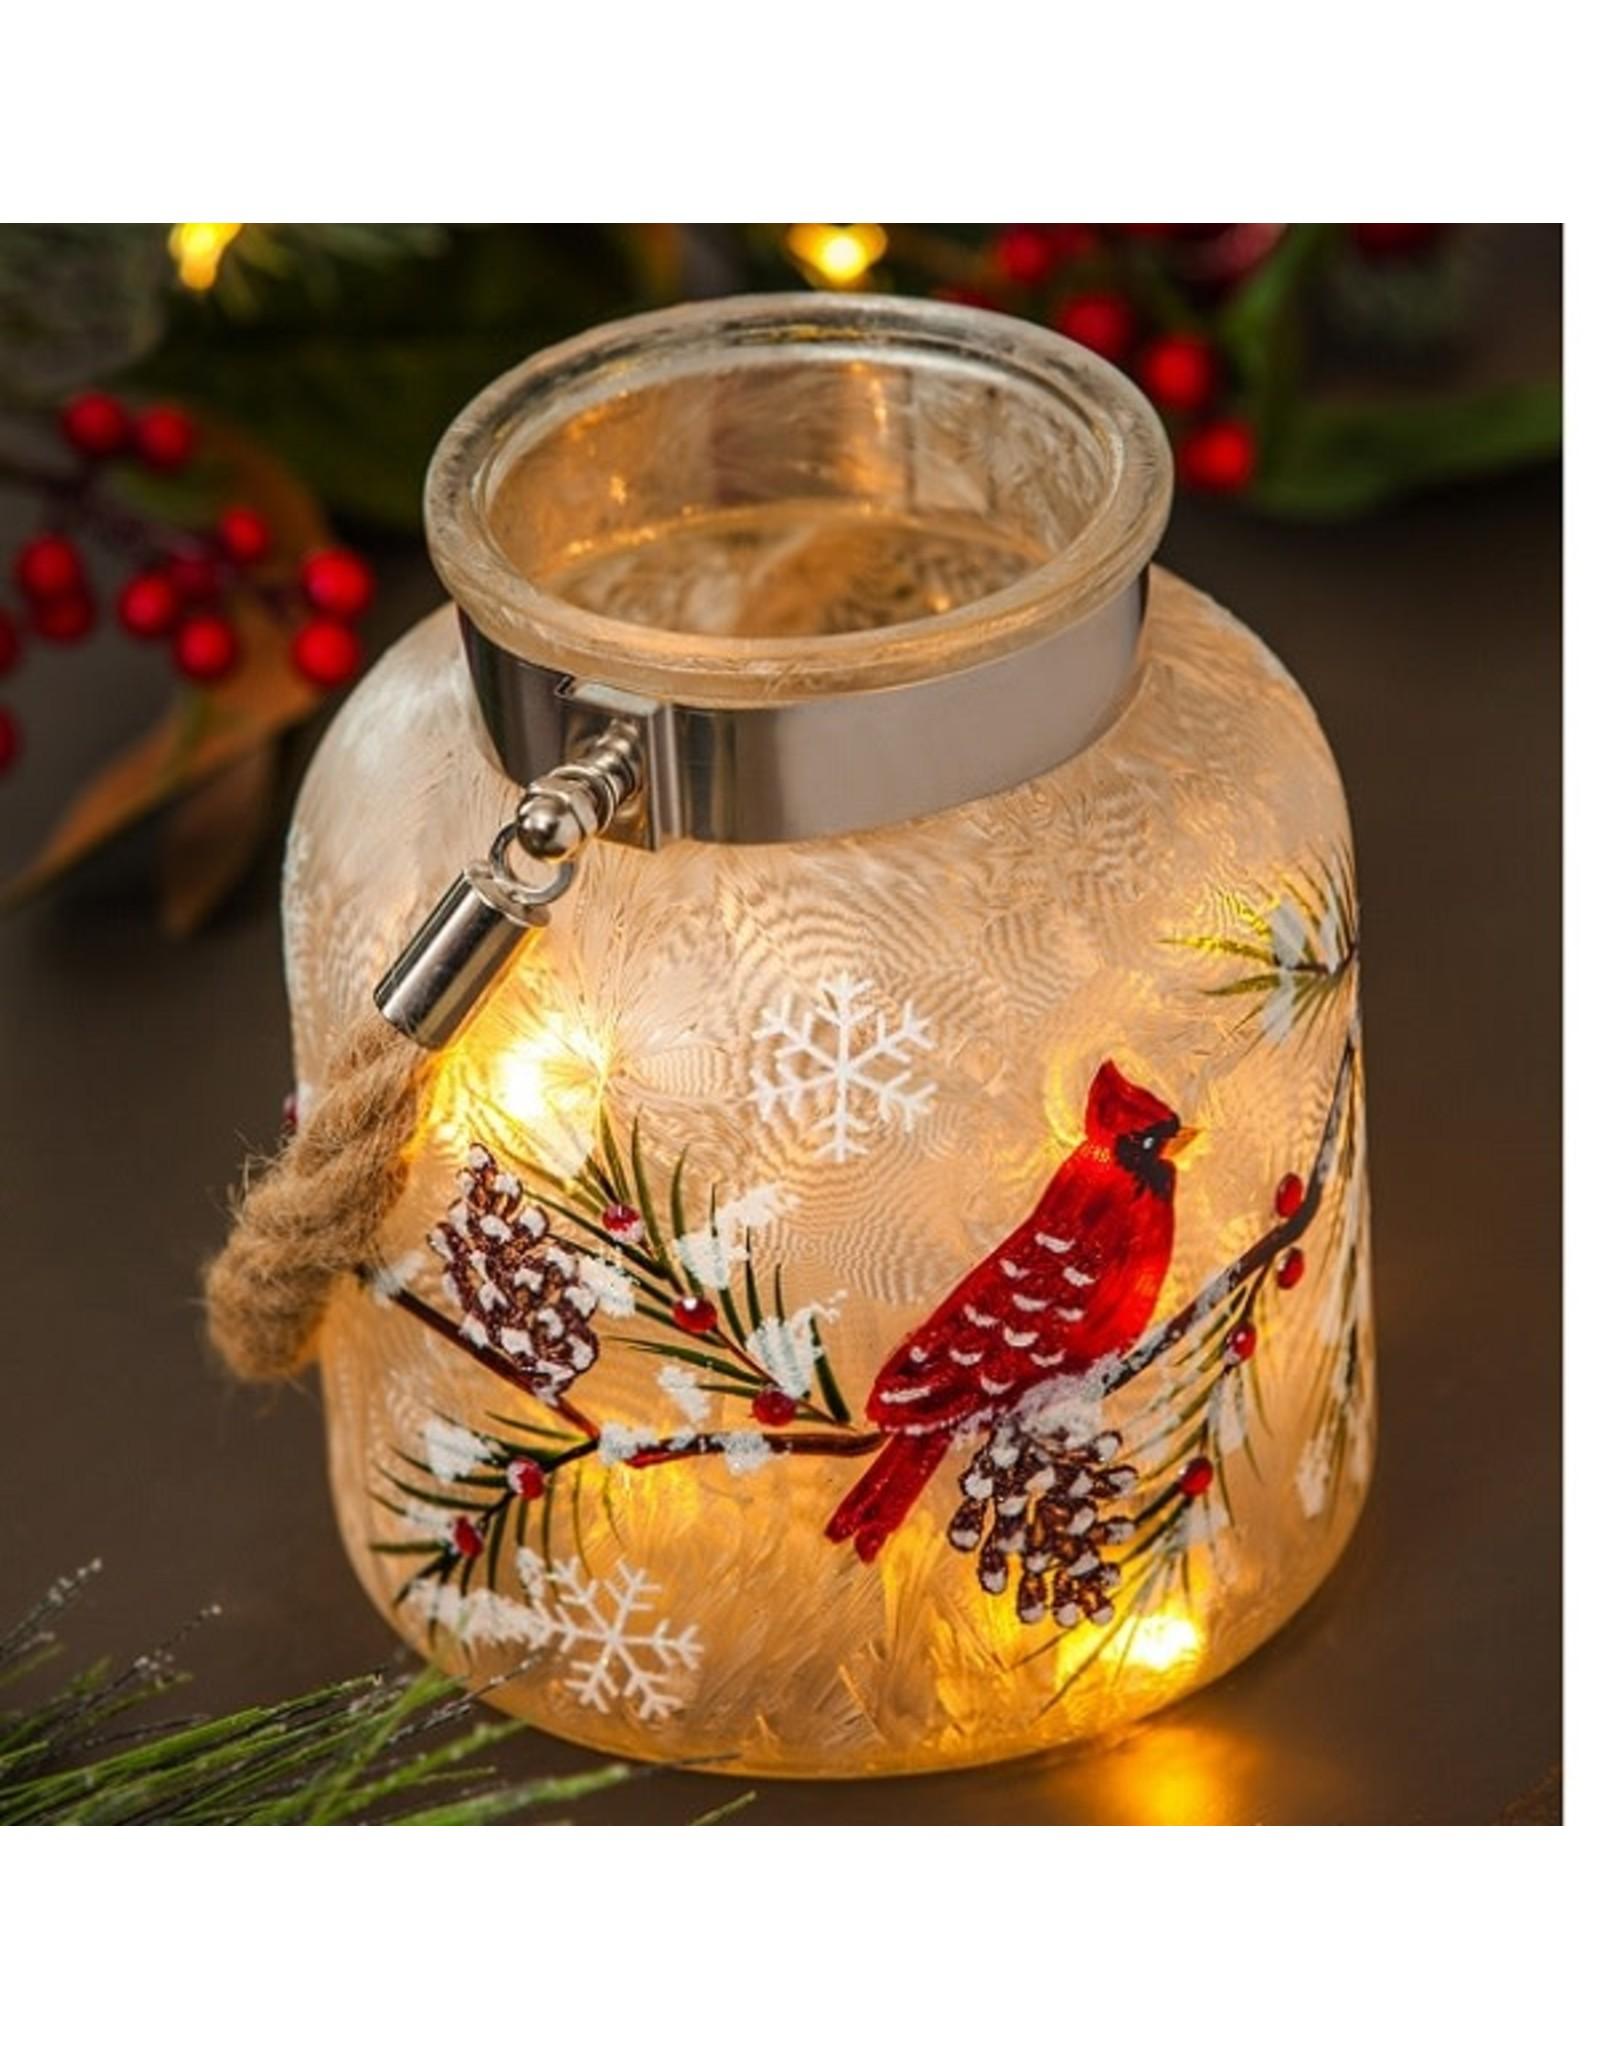 Evergreen CARDINAL PINE LED GLASS JAR